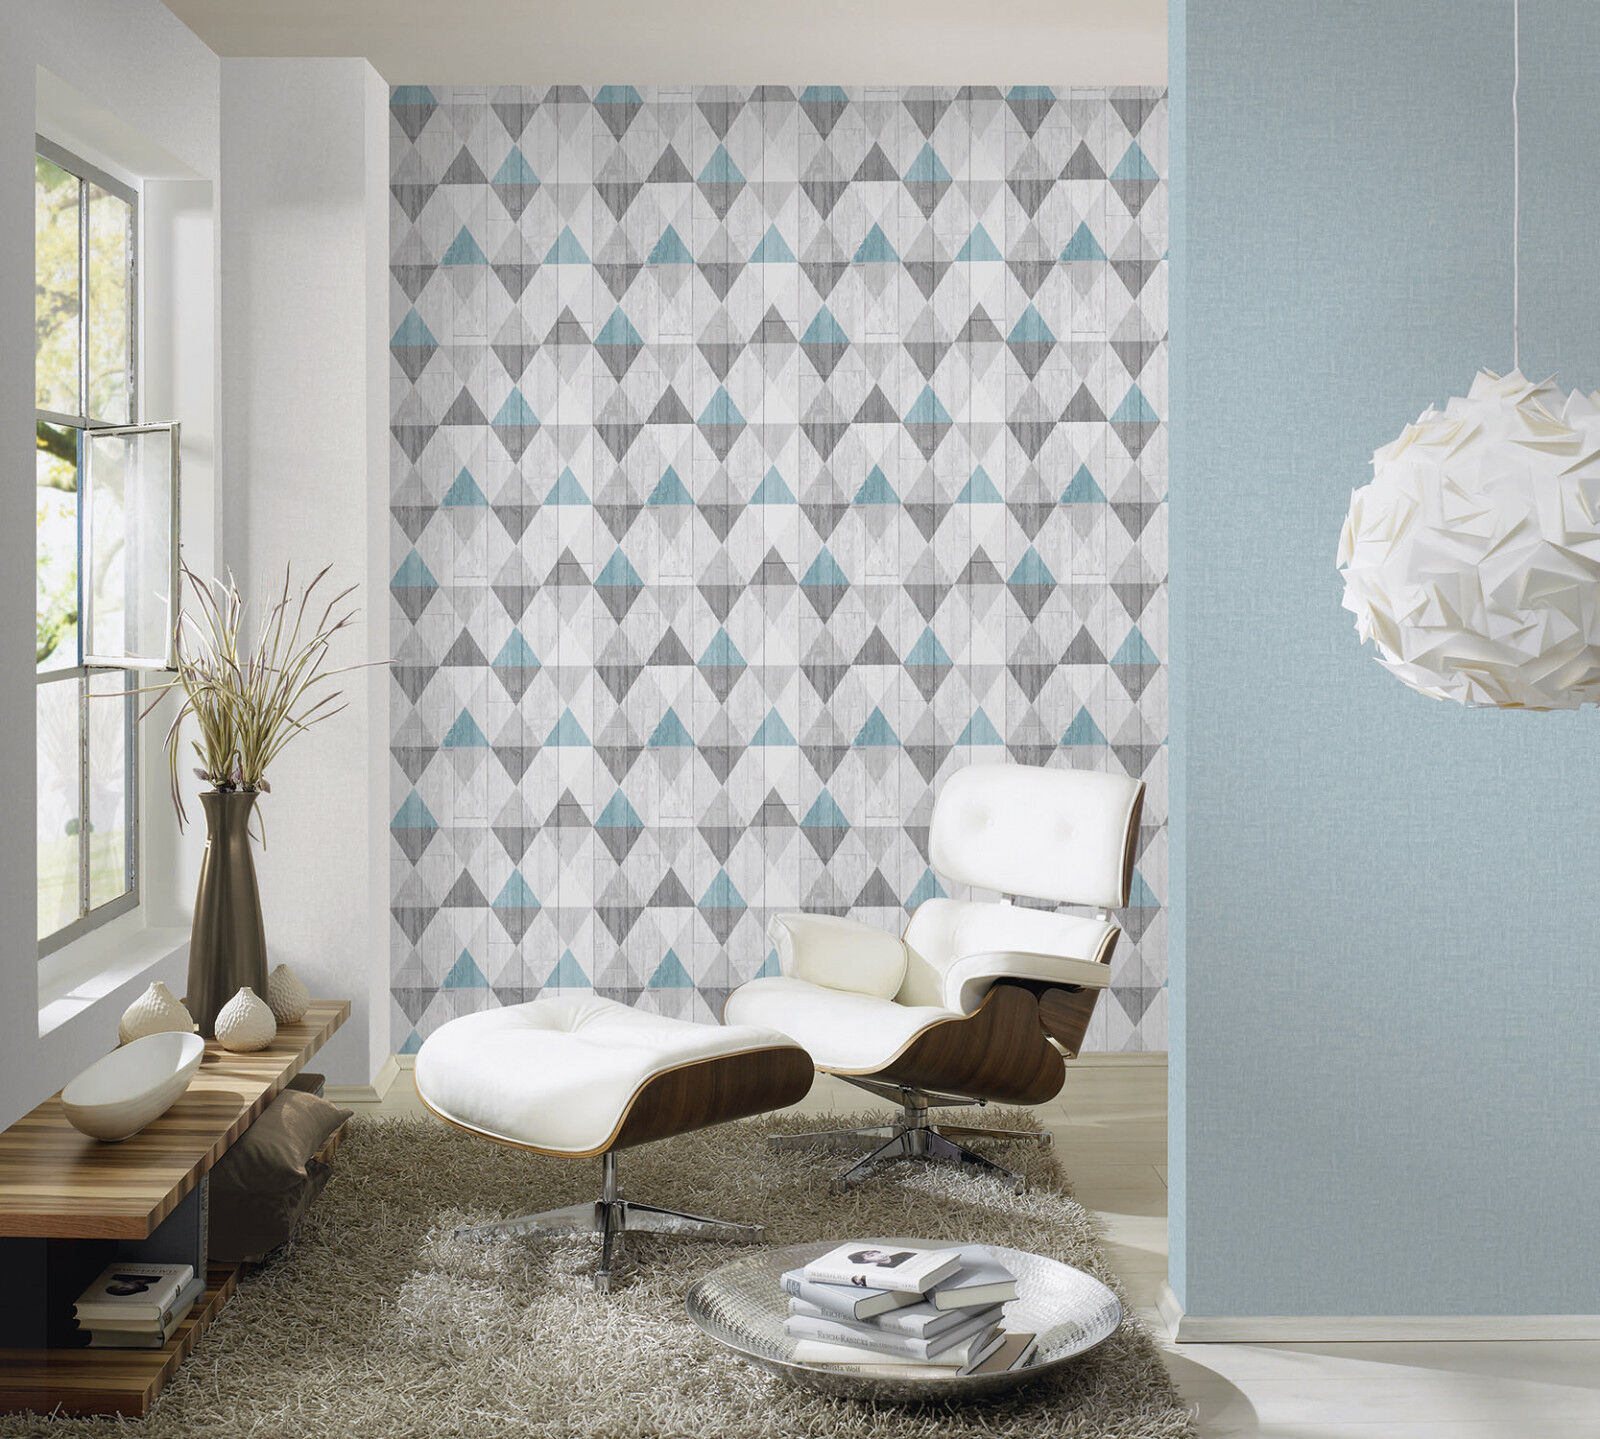 vlies tapete skandinavisch holzoptik paneele rauten karo muster t rkis blau grau kaufen bei. Black Bedroom Furniture Sets. Home Design Ideas